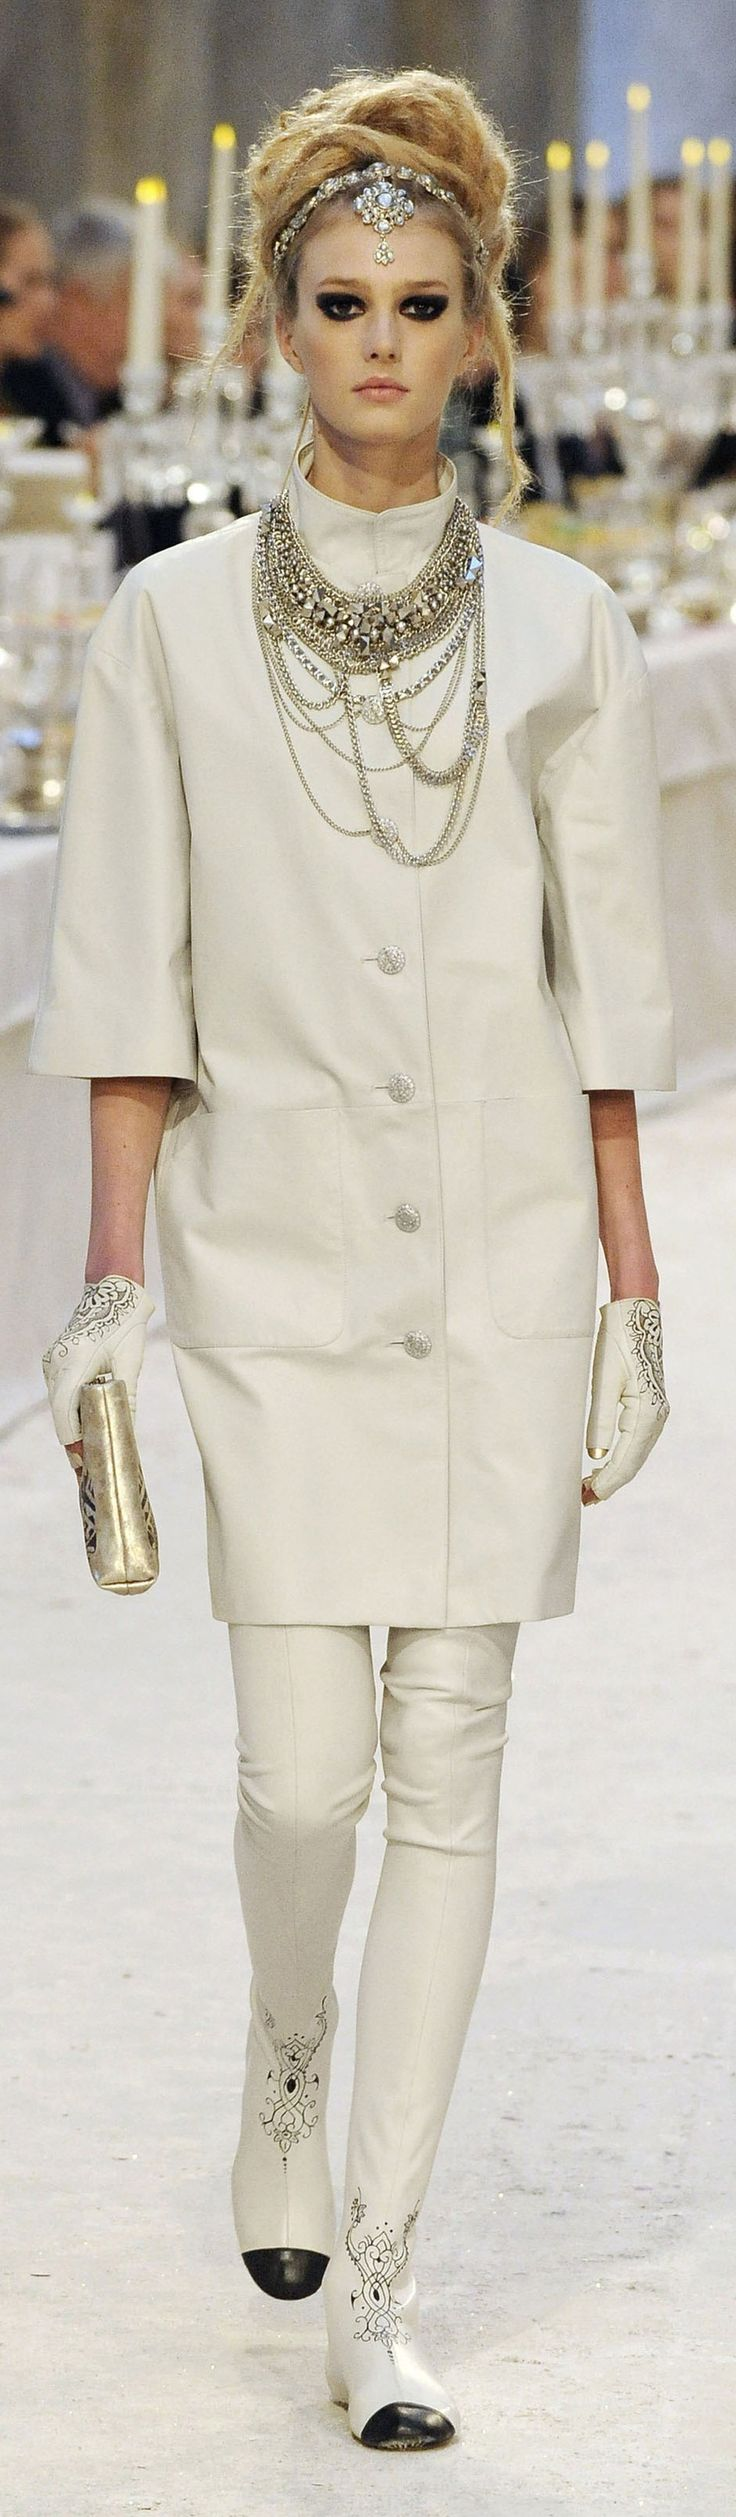 Classic Chanel #dressmaking